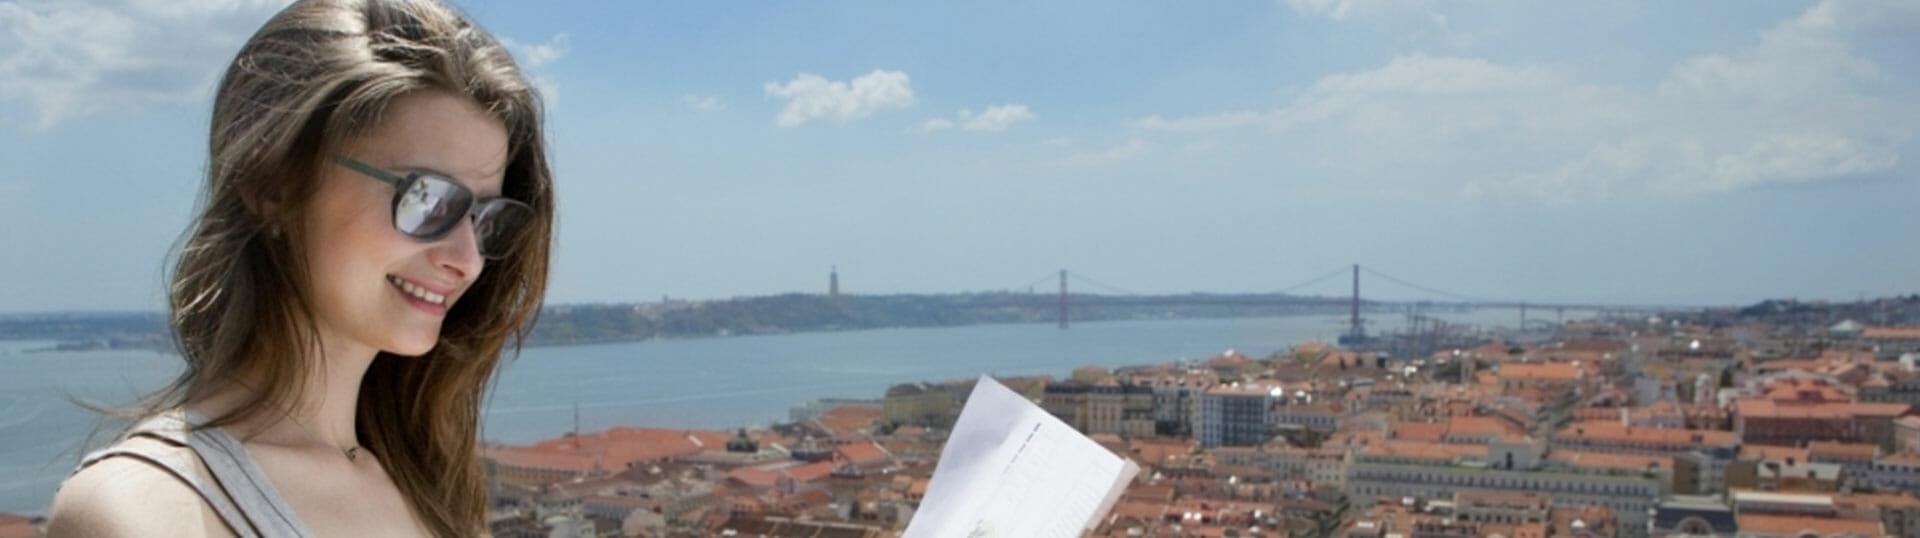 Klassenfahrt-nach-Portugal